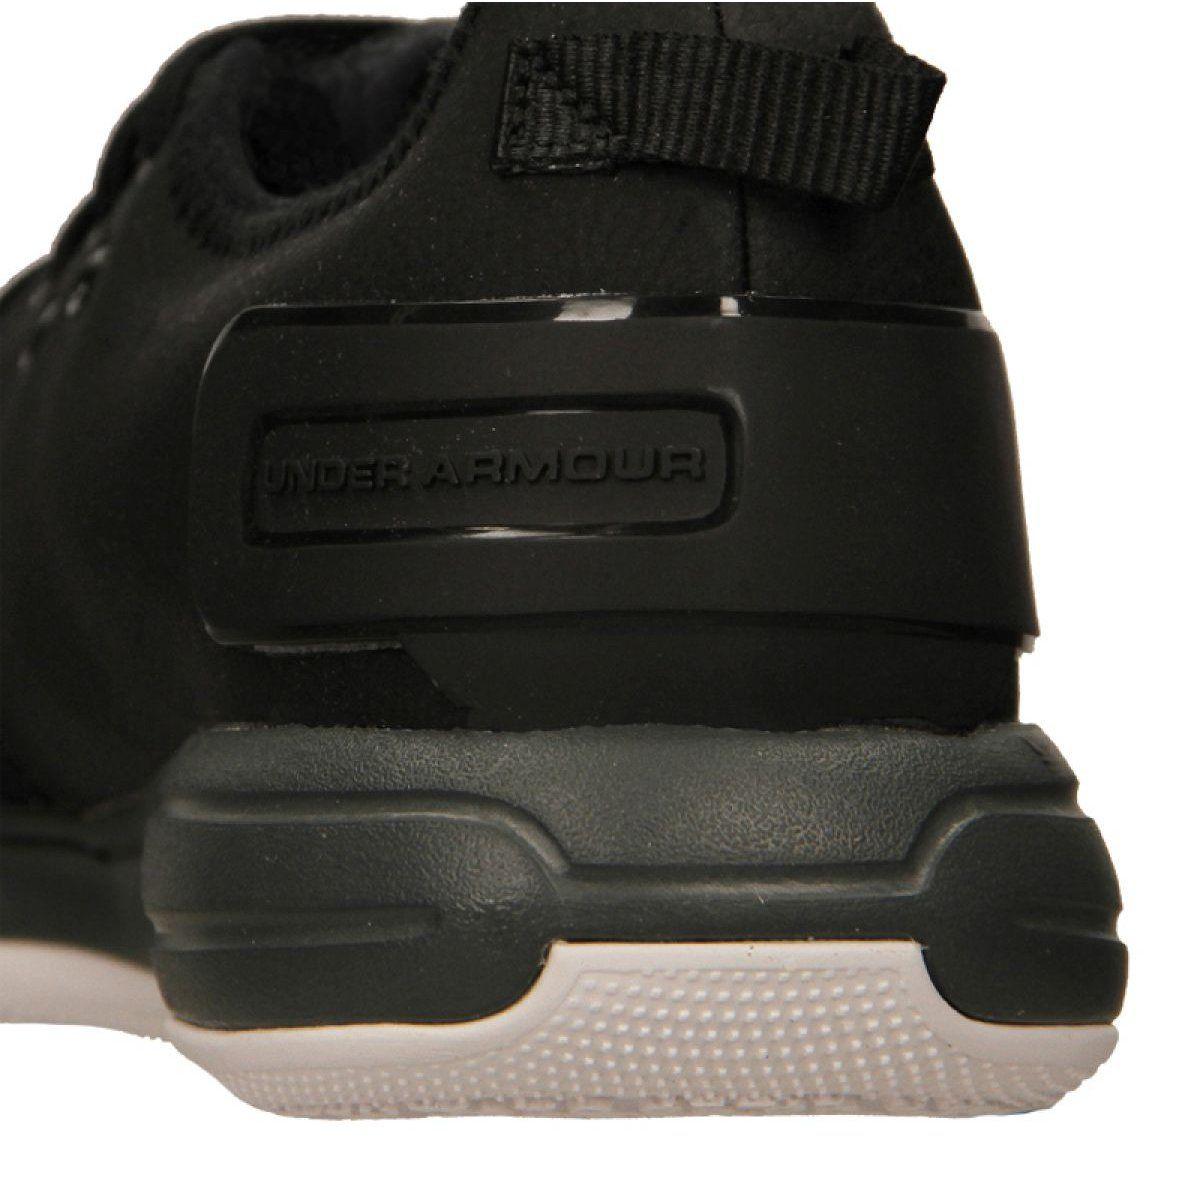 Sportowe Meskie Underarmour Czarne Buty Treningowe Under Armour Charged Ultimate 3 0 M 3021294 001 Training Shoes Under Armor Under Armour